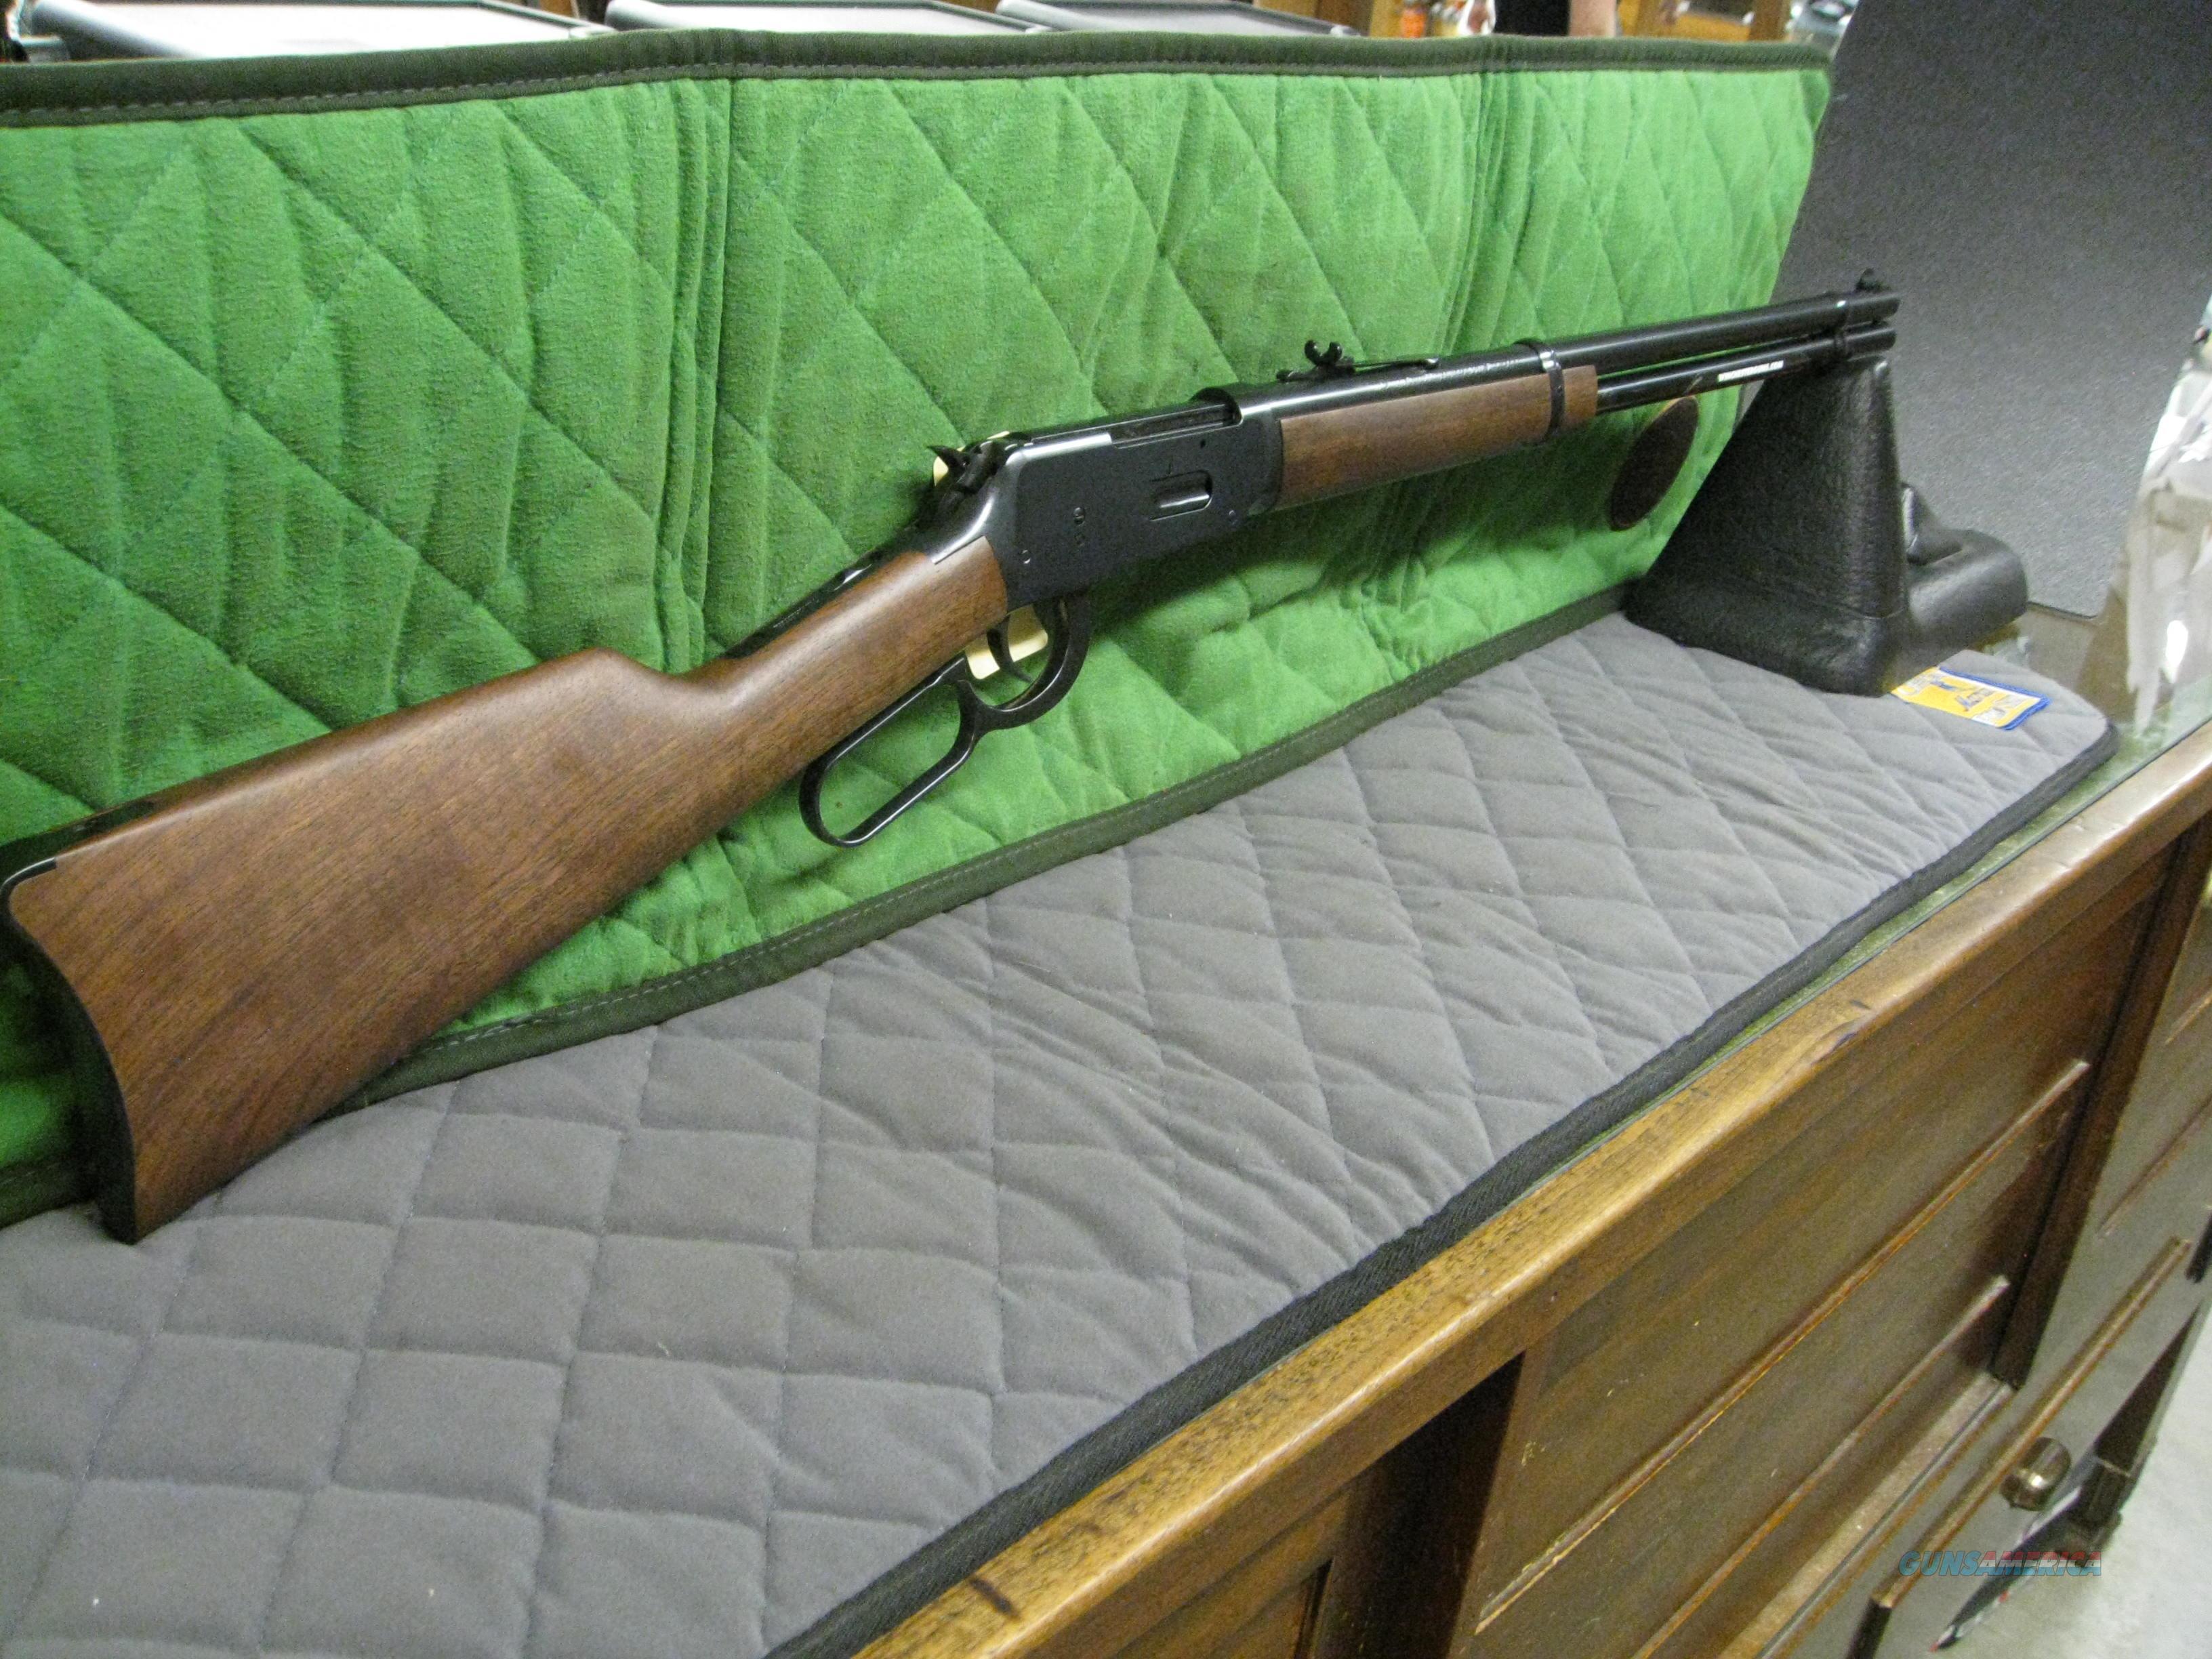 Winchester Model 94 Carbine .30-30  **NEW** 534199114  Guns > Rifles > Winchester Rifles - Modern Lever > Model 94 > Post-64